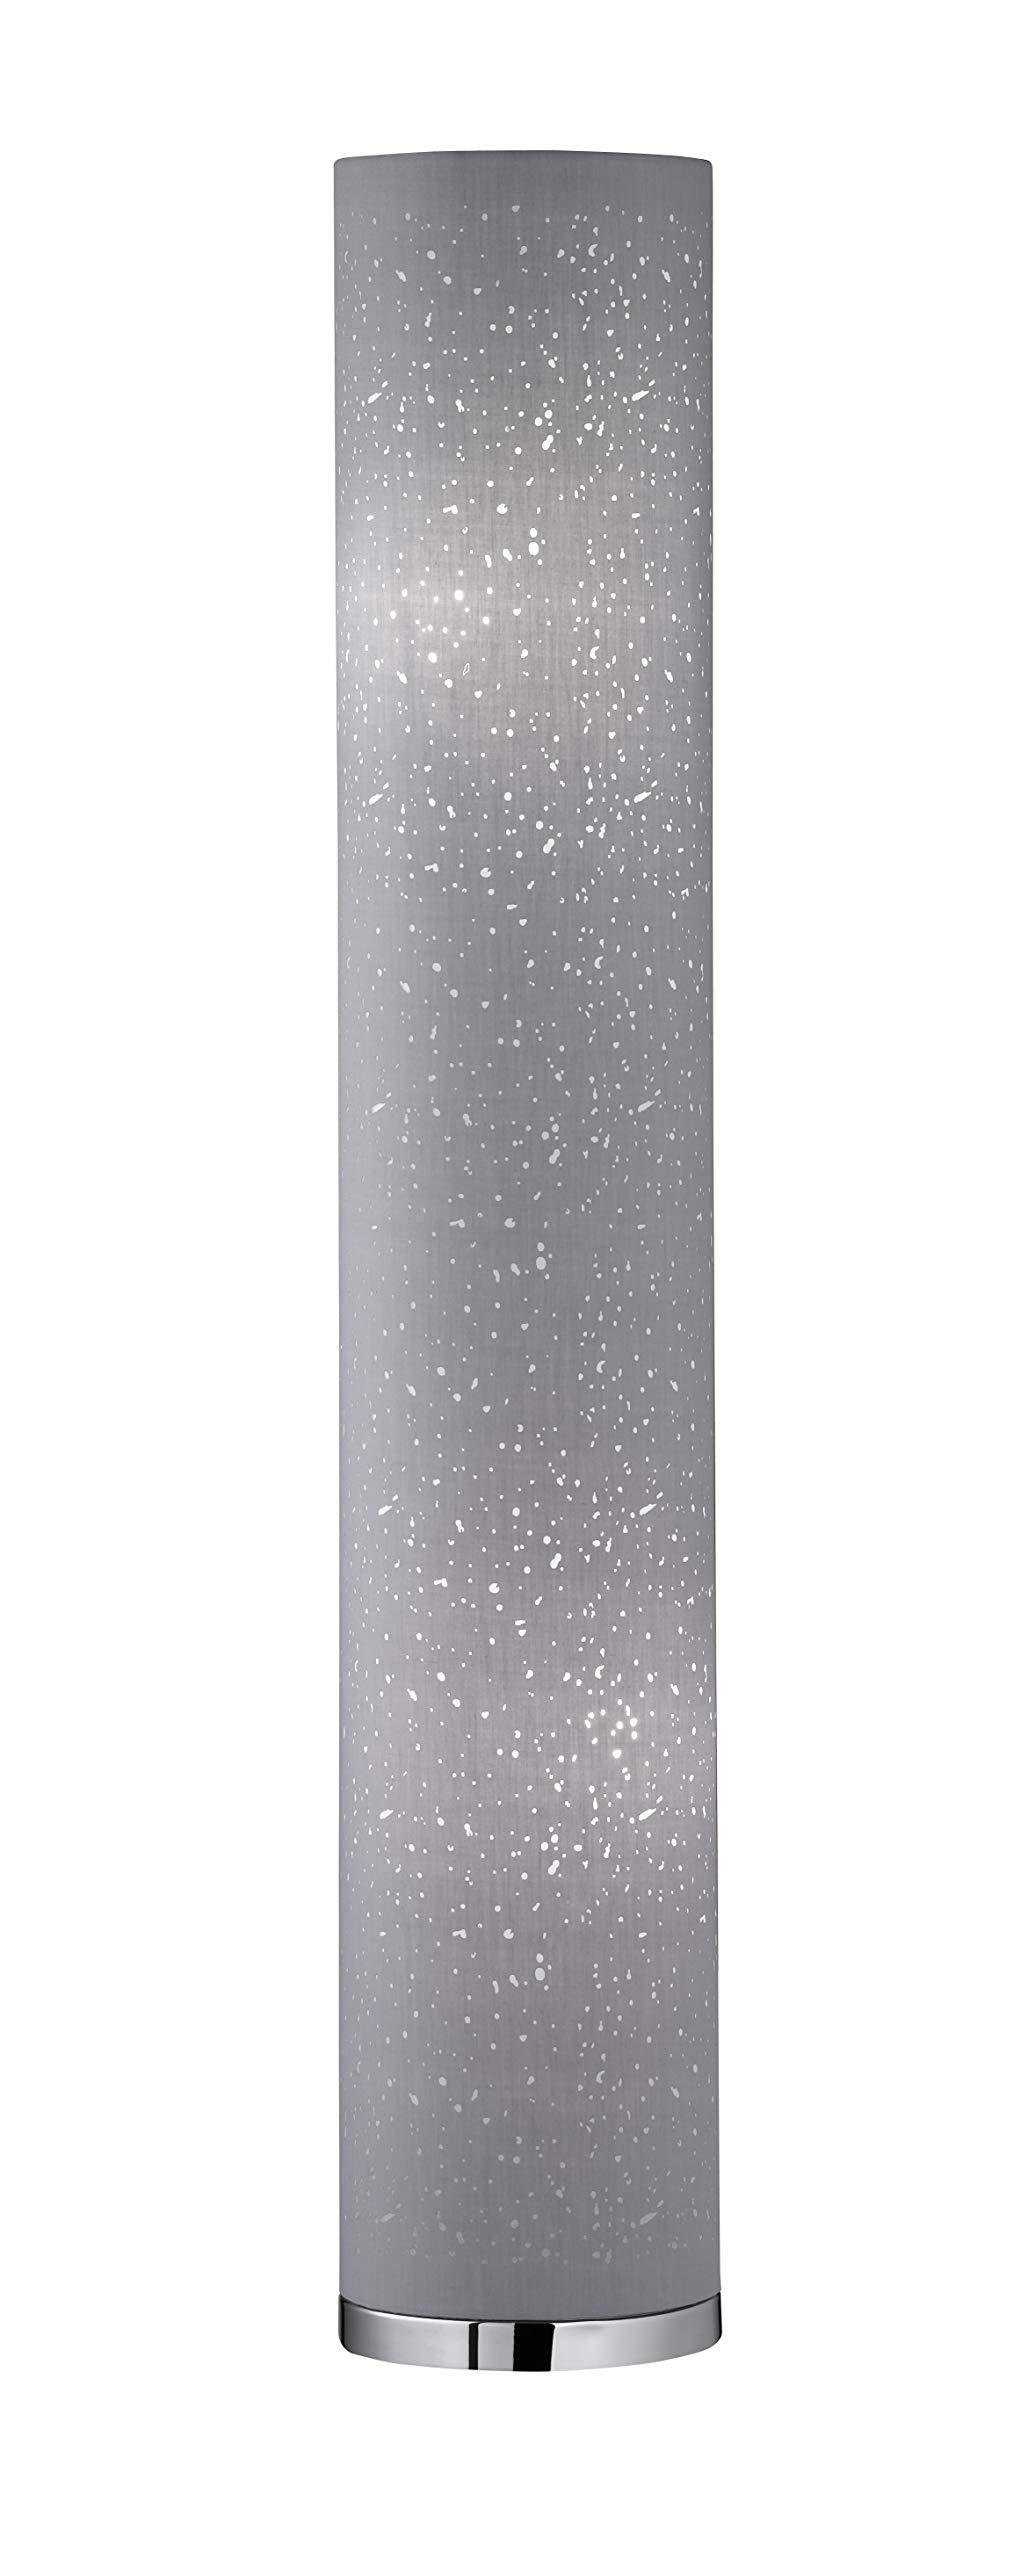 Fischer&Honsel 雷神 落地灯,金属,25 W,铬色